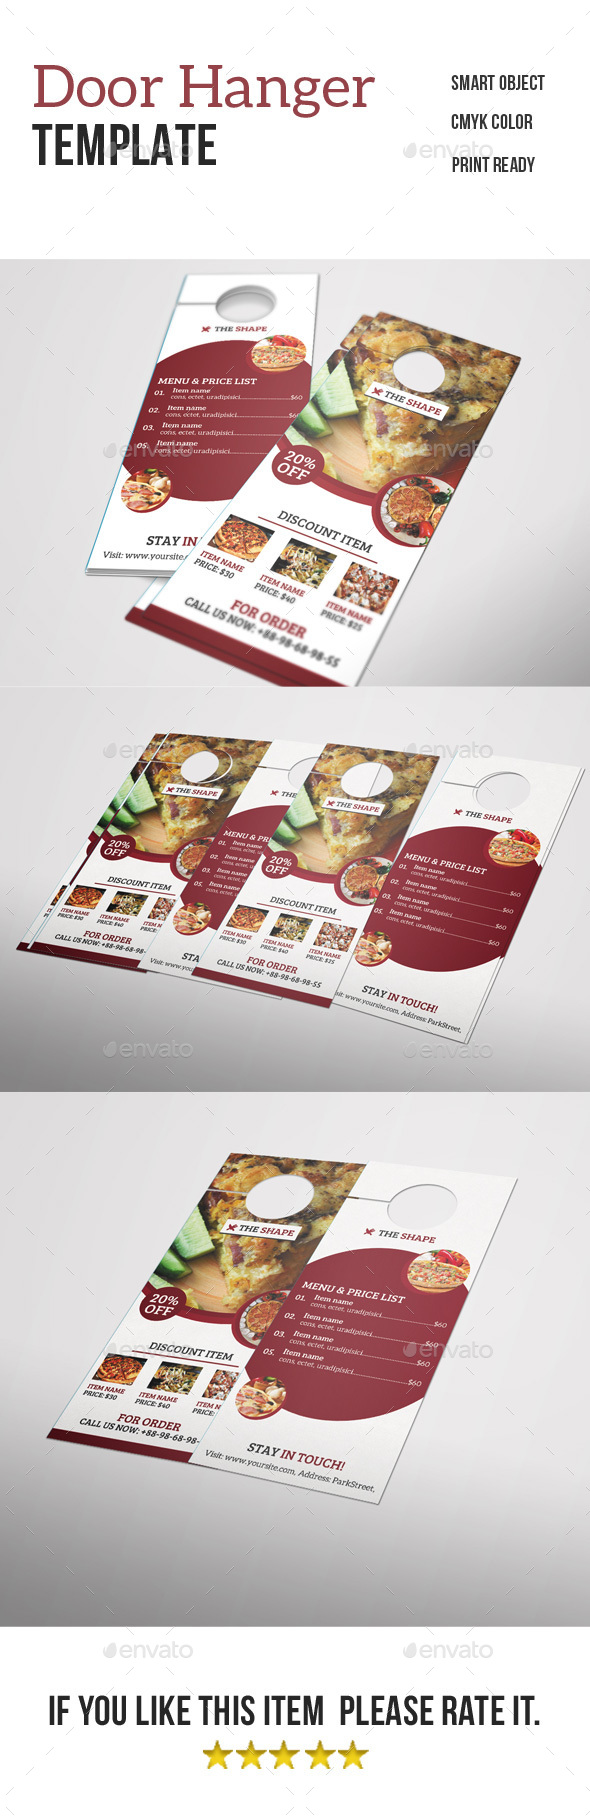 Japanese Food Restaurant Graphics, Designs & Templates